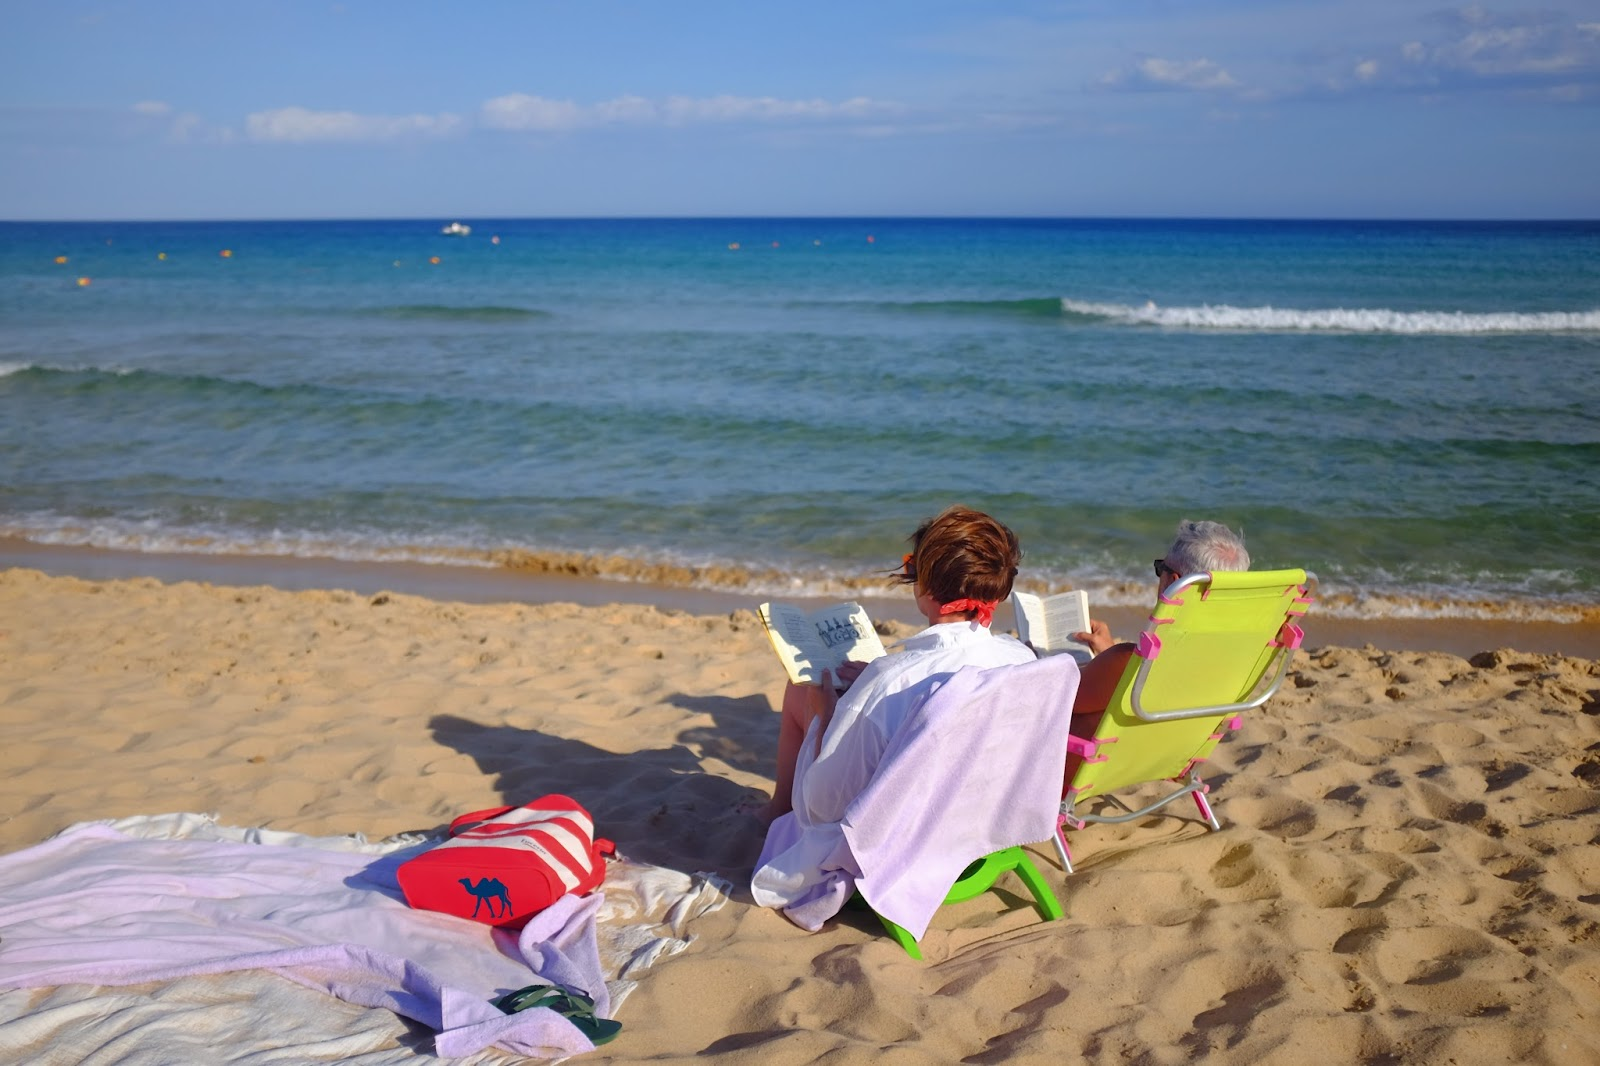 Le Chameau Bleu - Plage proche de Cagliari